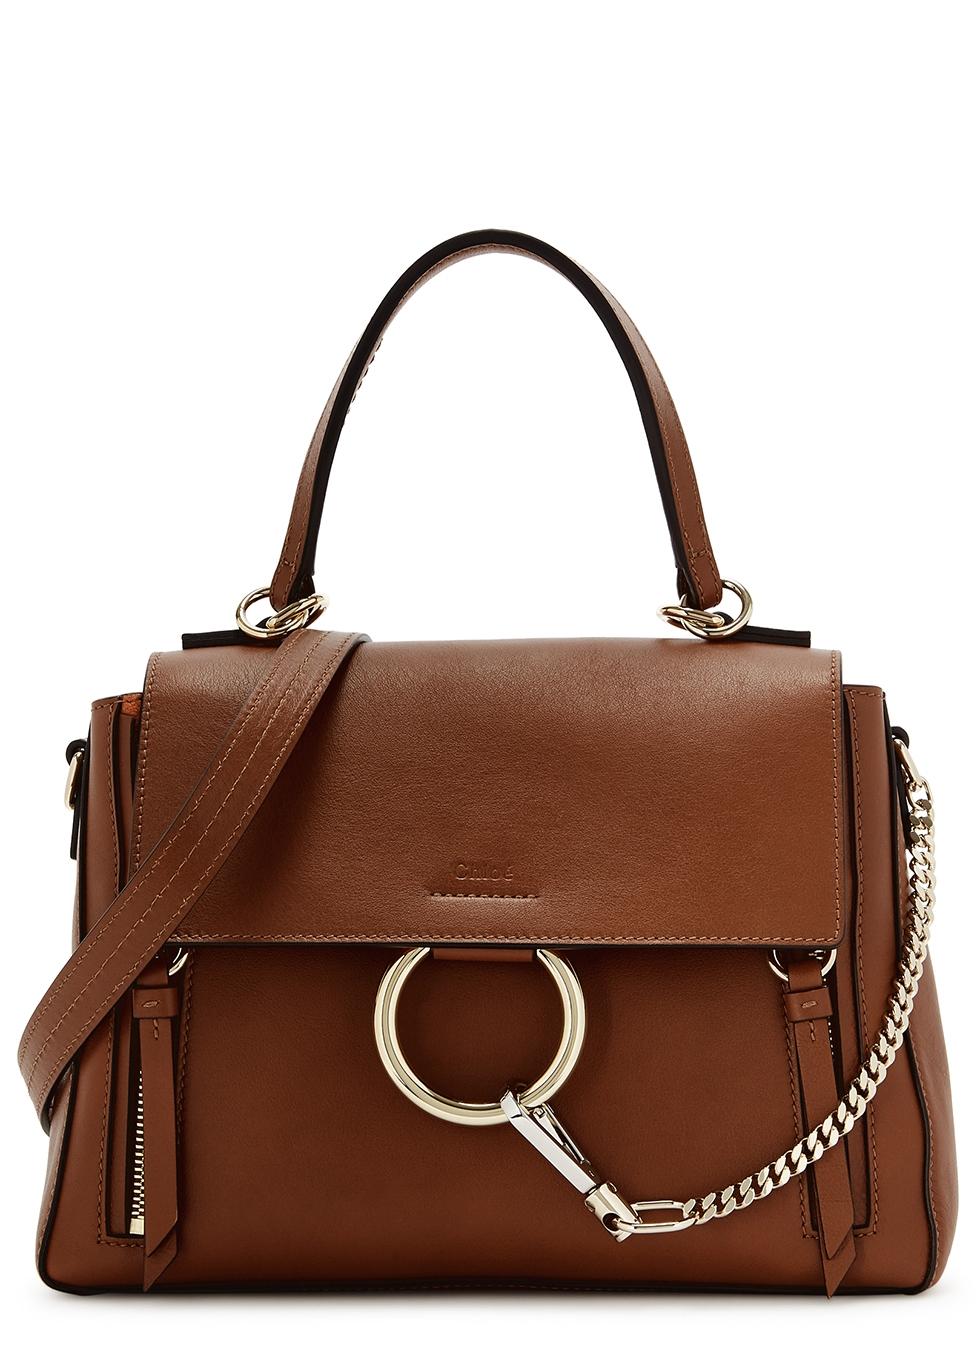 CHLOÉ   Chloé Faye Day Small Leather Shoulder Bag   Goxip